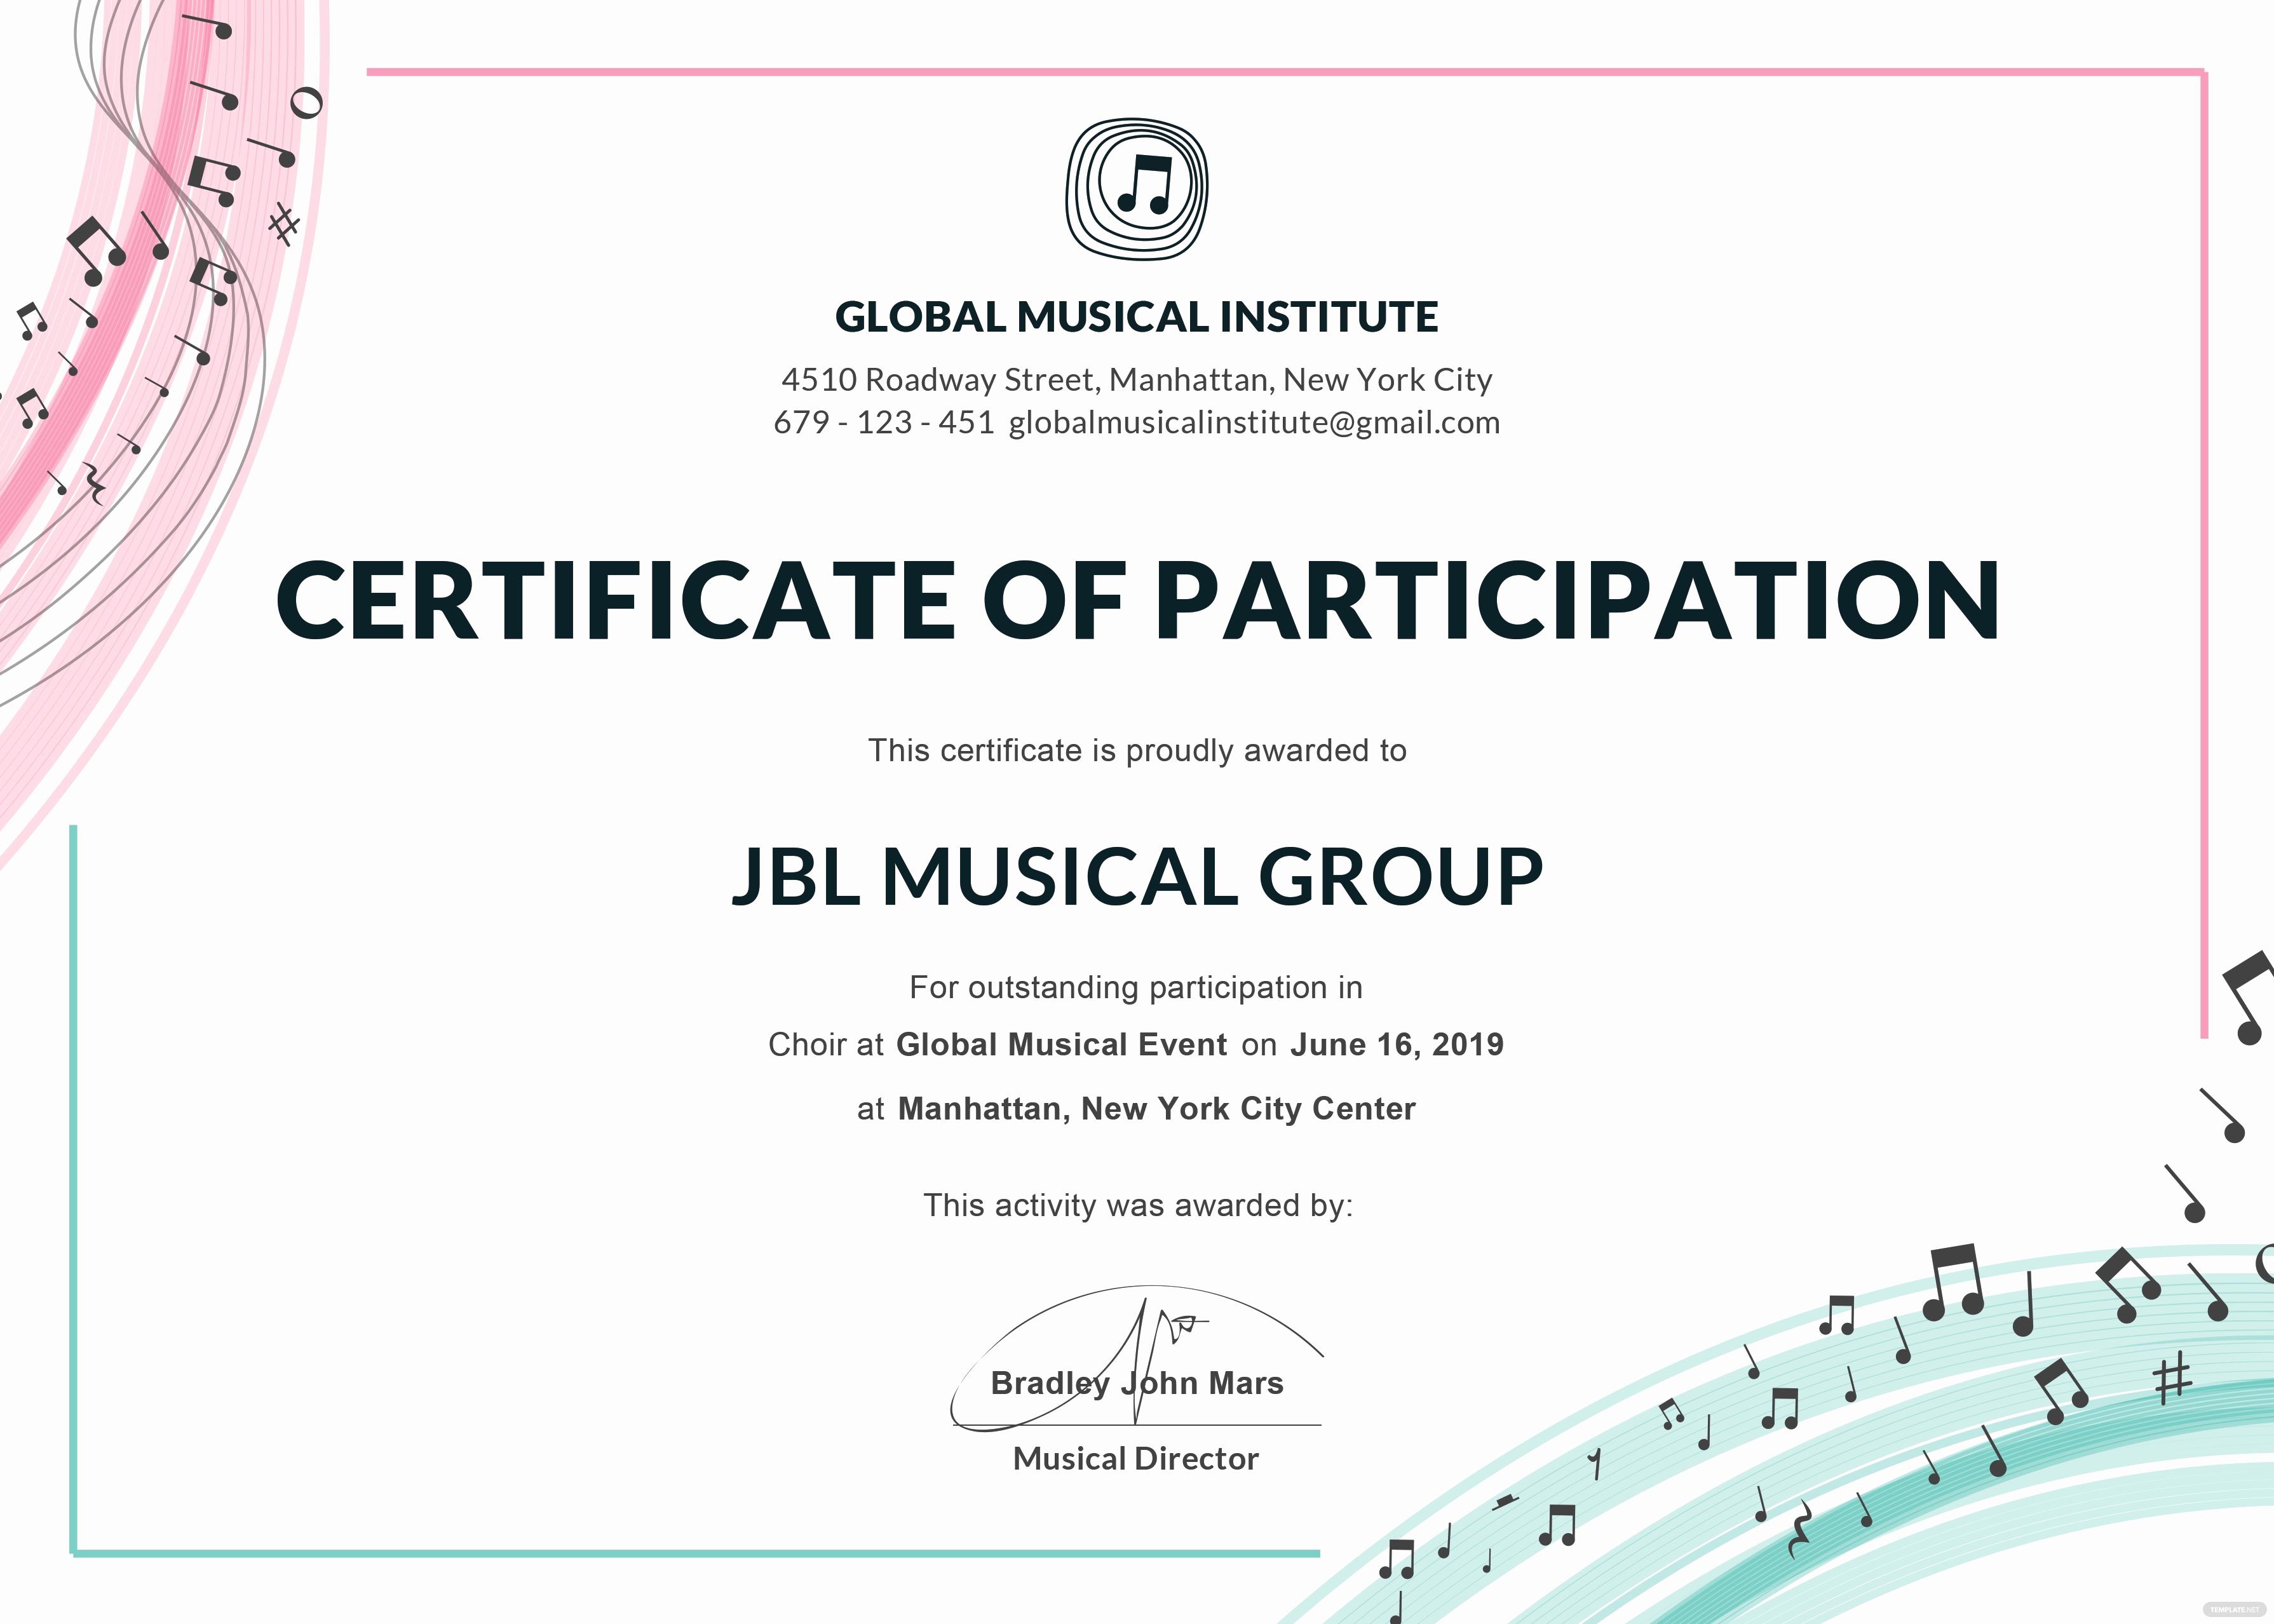 Certificate Of Participation Template Unique Free Choir Certificate Of Participation Template In Adobe